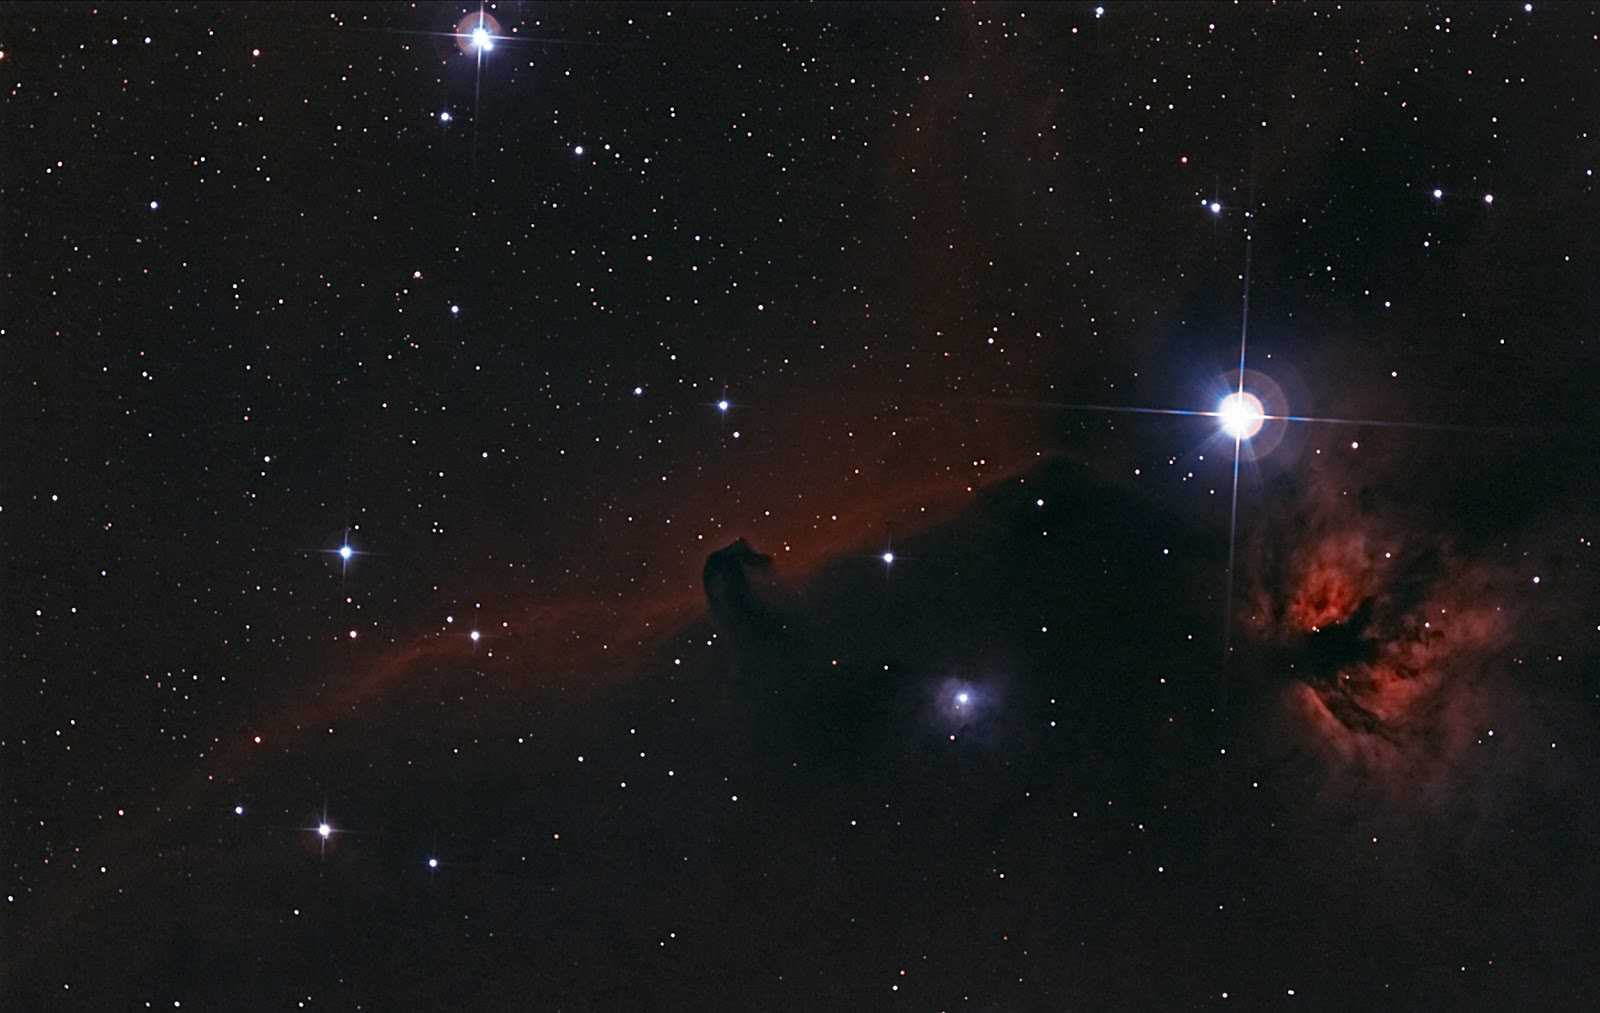 Good   Wallpaper Horse Nebula - Horsehead-Nebula-Wallpaper-HD-10  You Should Have_152118.jpg